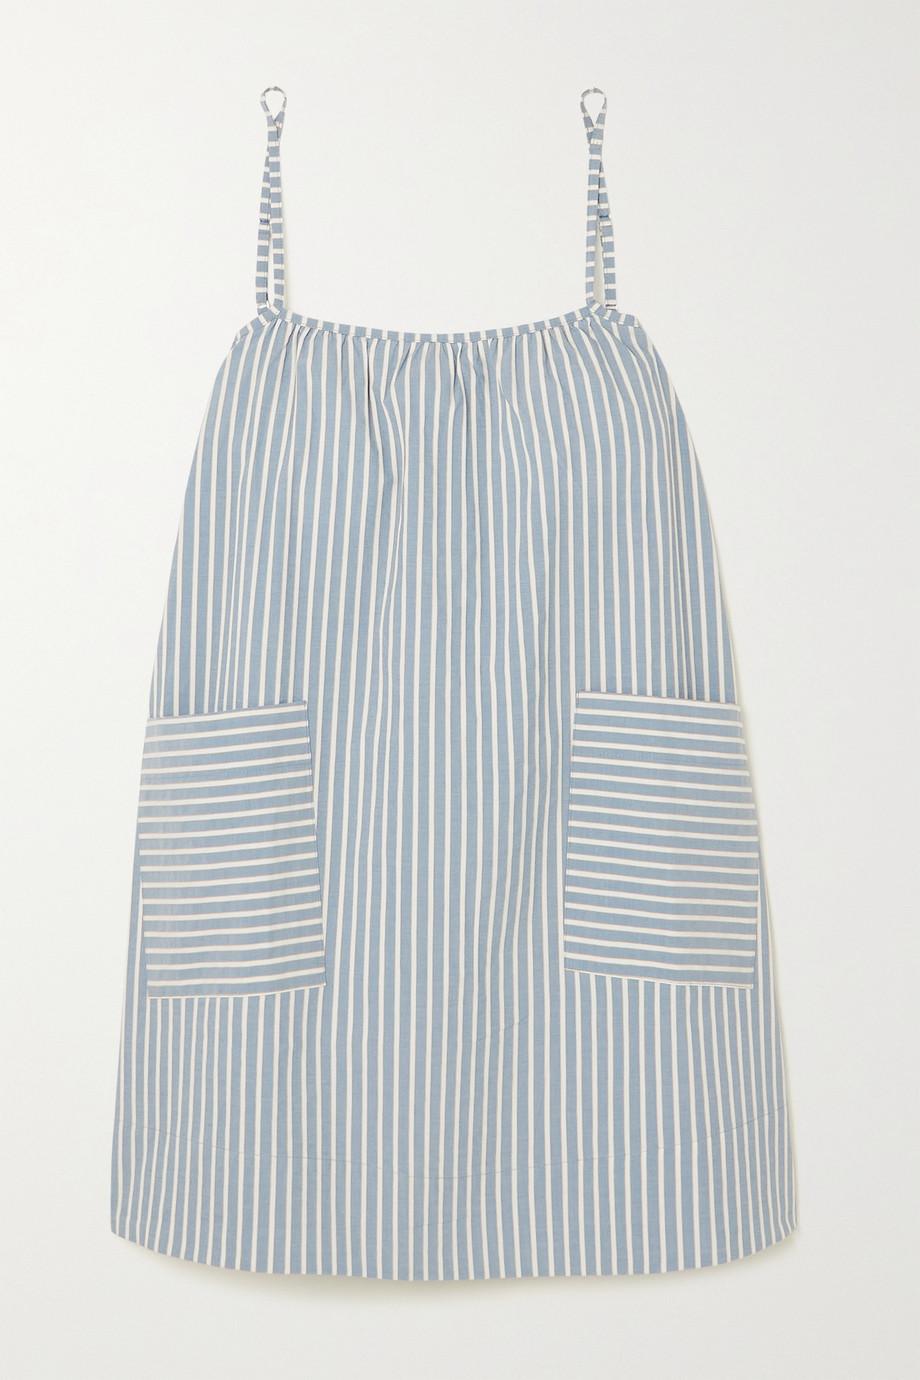 ELSE Hamptons gestreiftes Nachthemd aus Baumwollpopeline